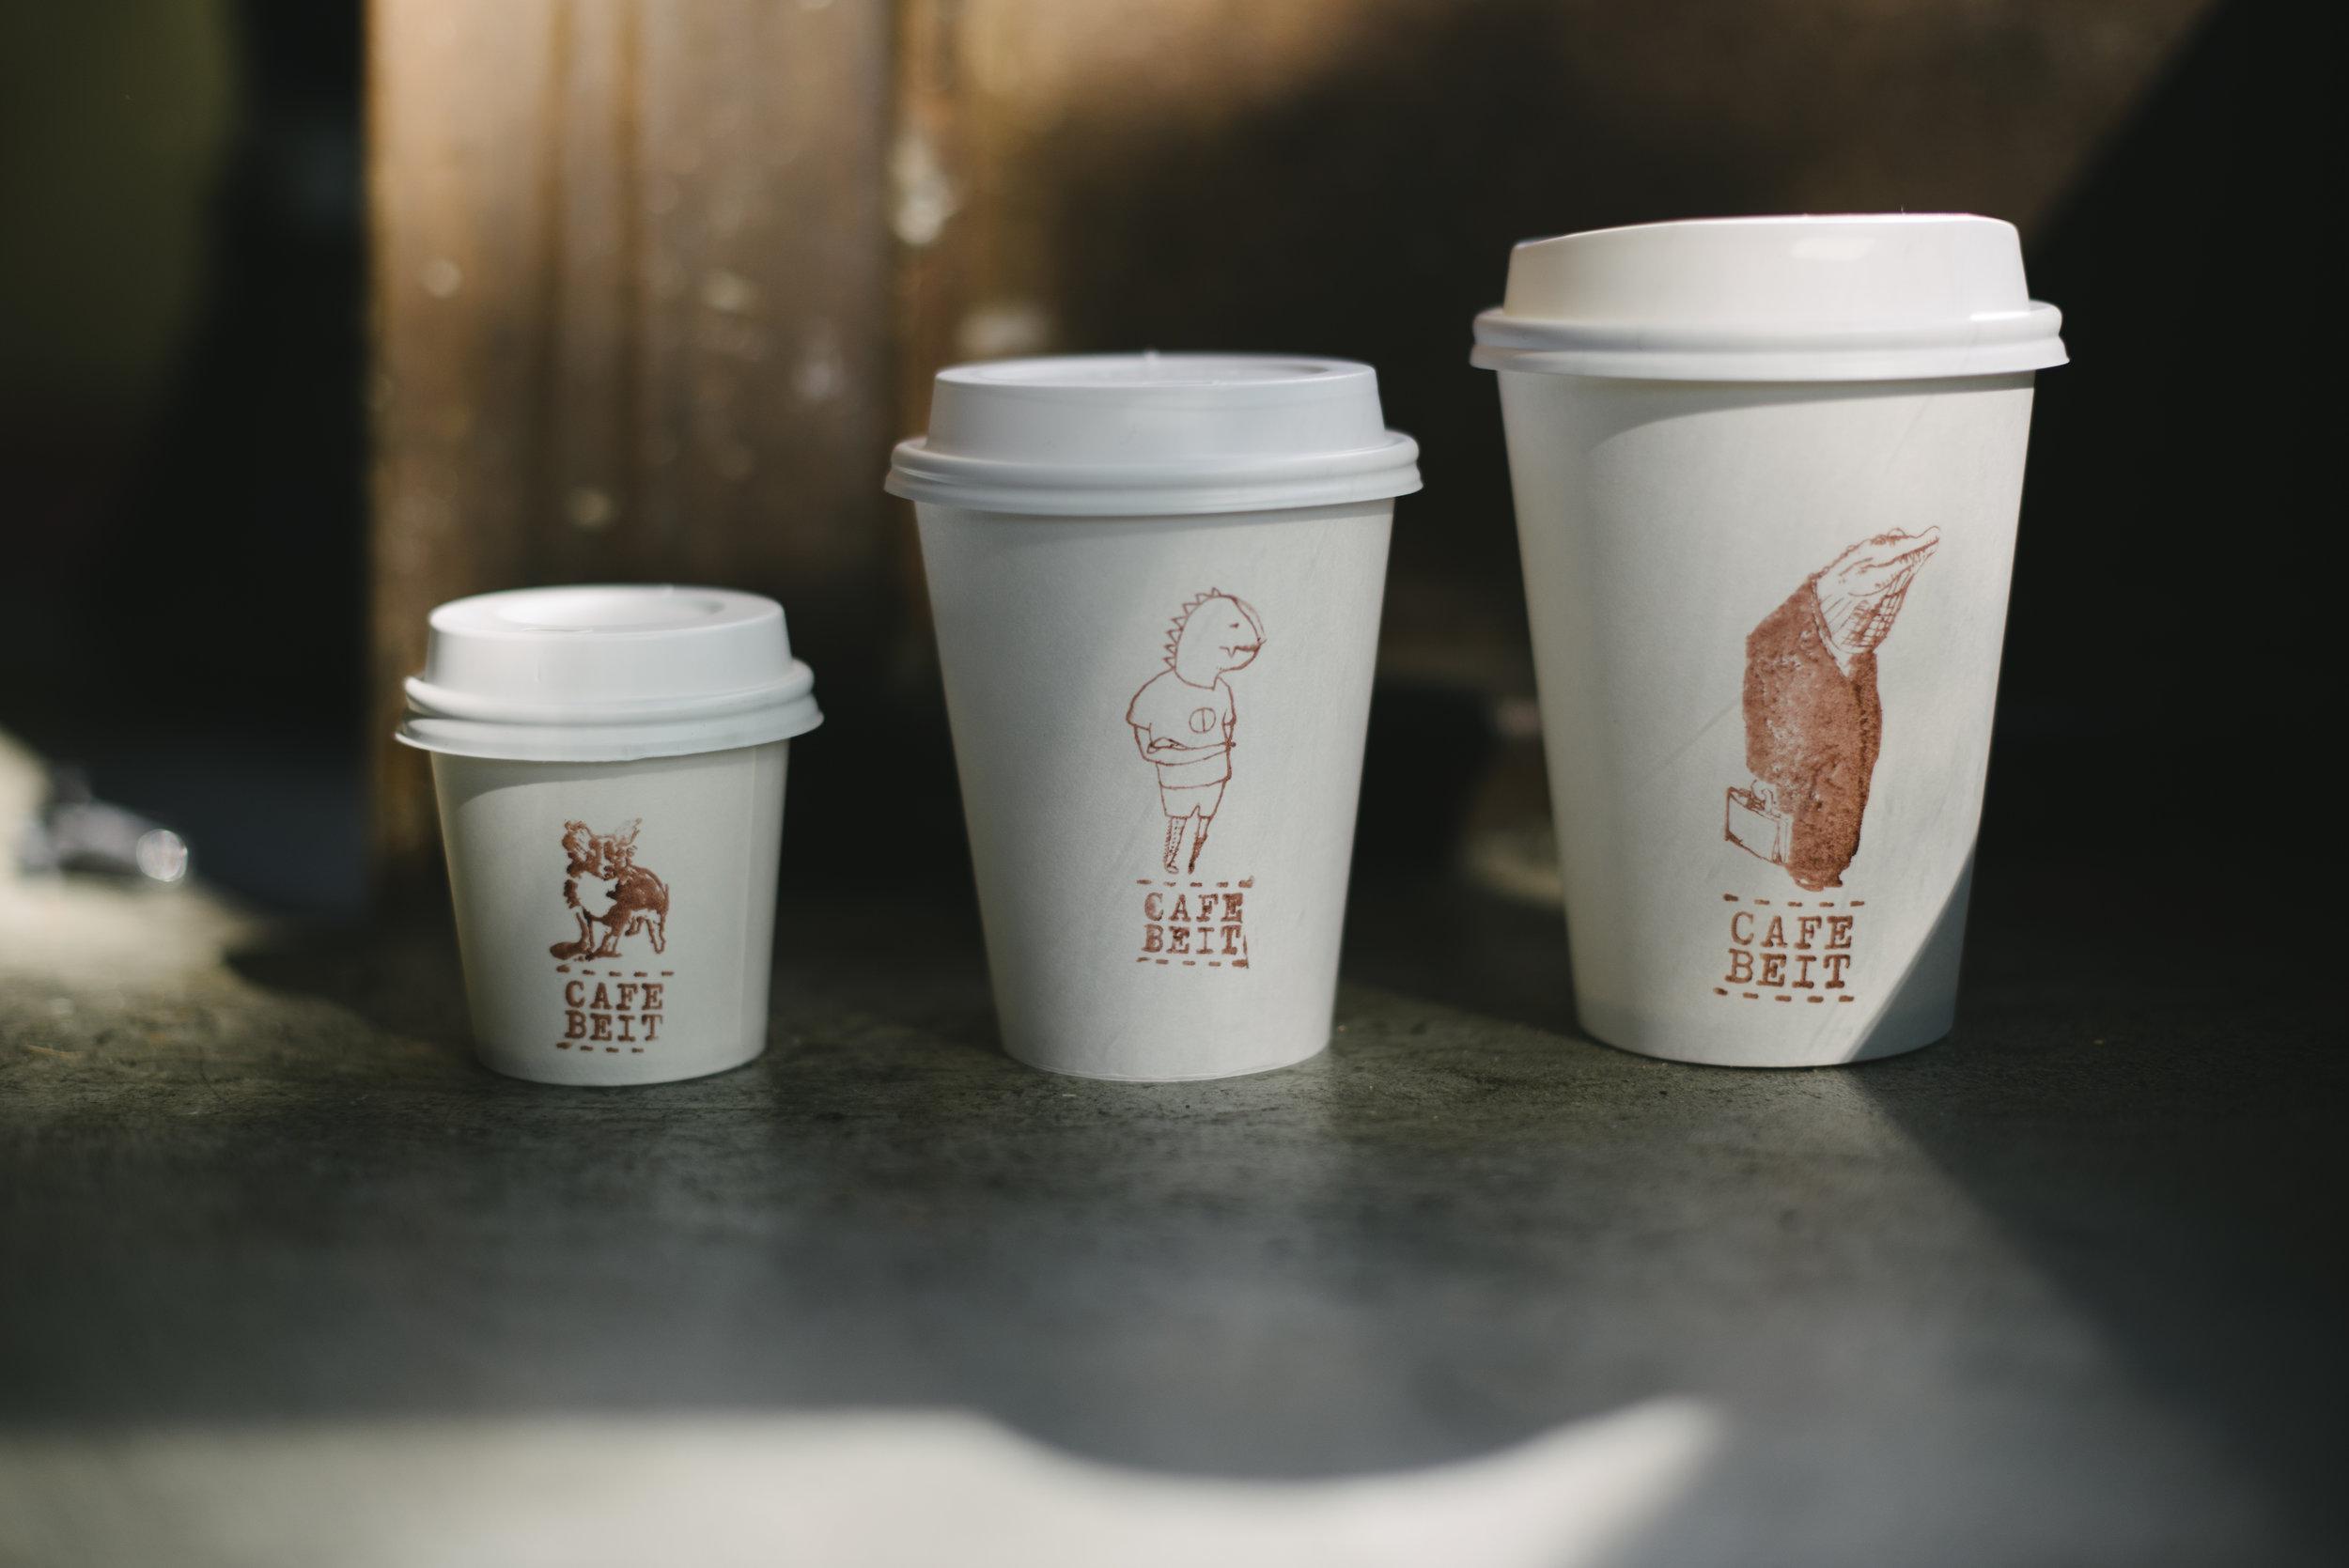 MC Cafe Beit 01.jpg